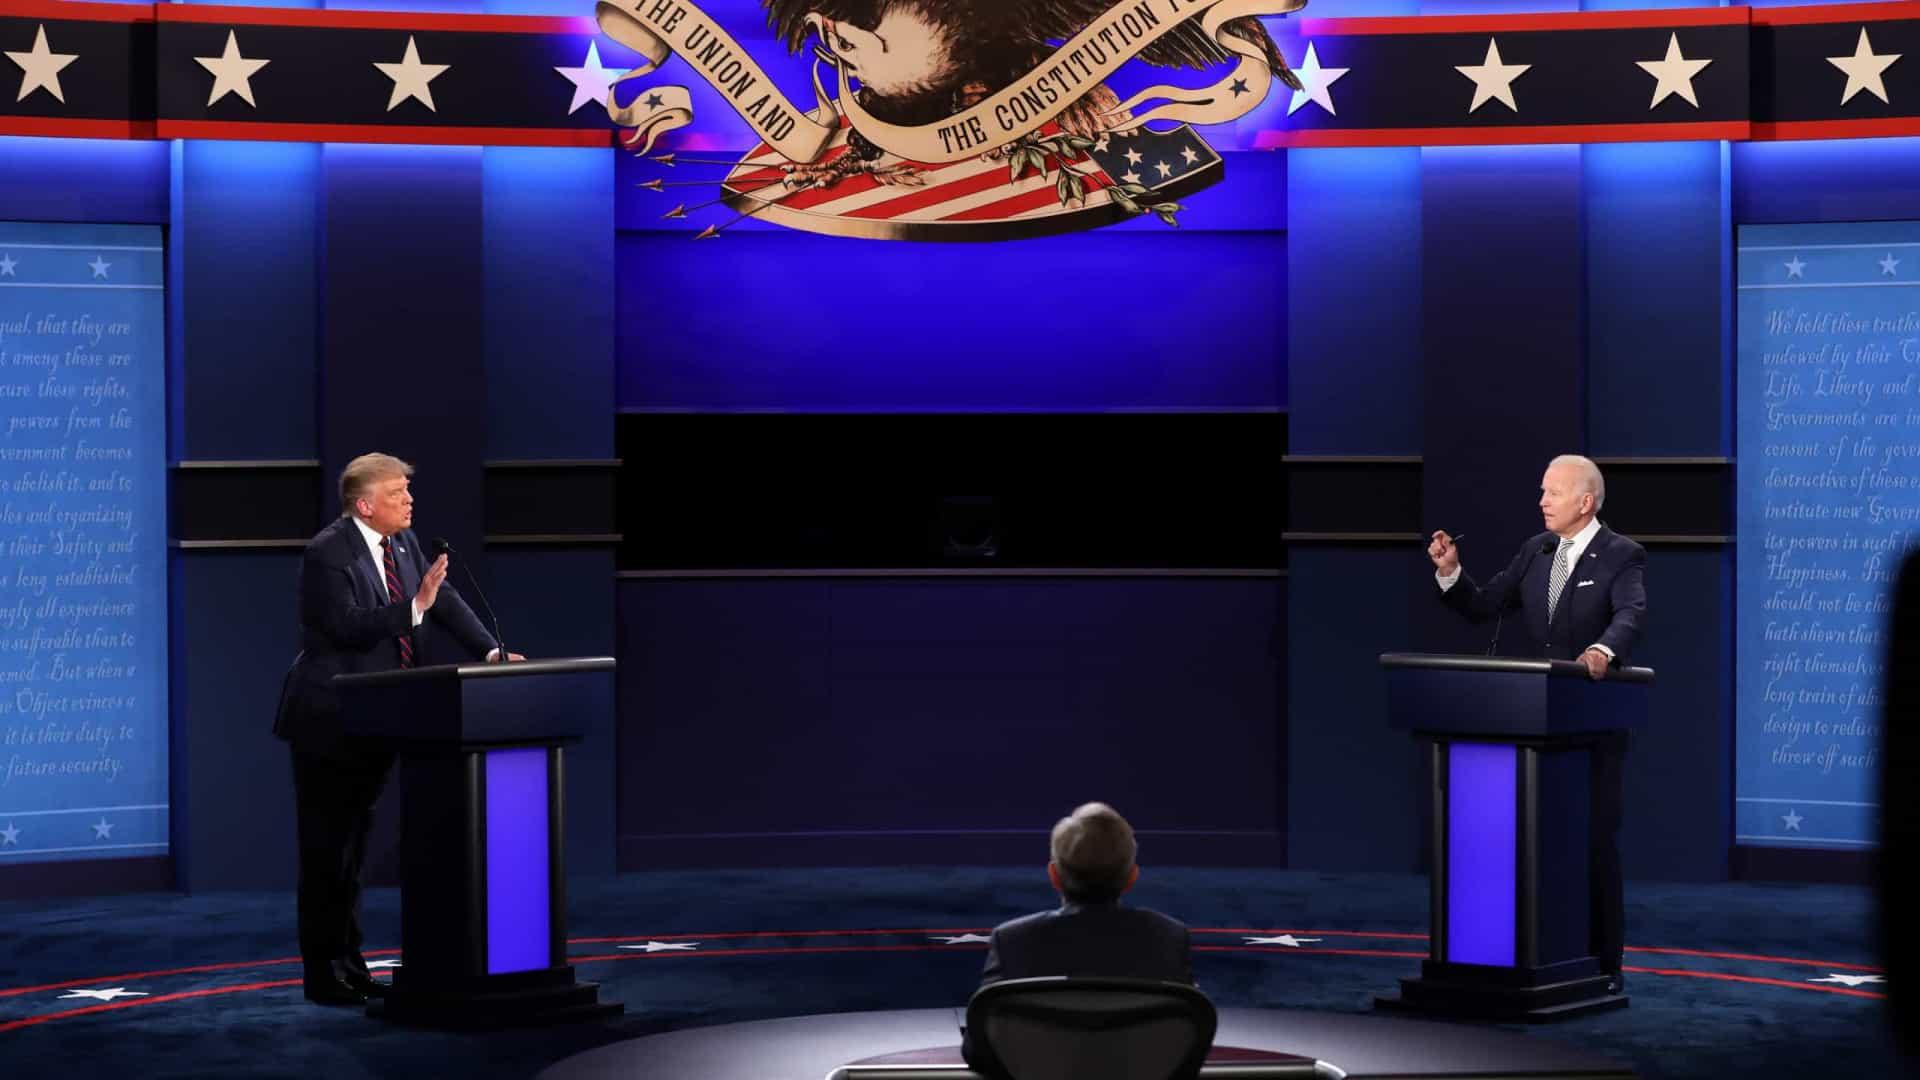 Os 5 assuntos mais comentados no último debate de Trump e Biden